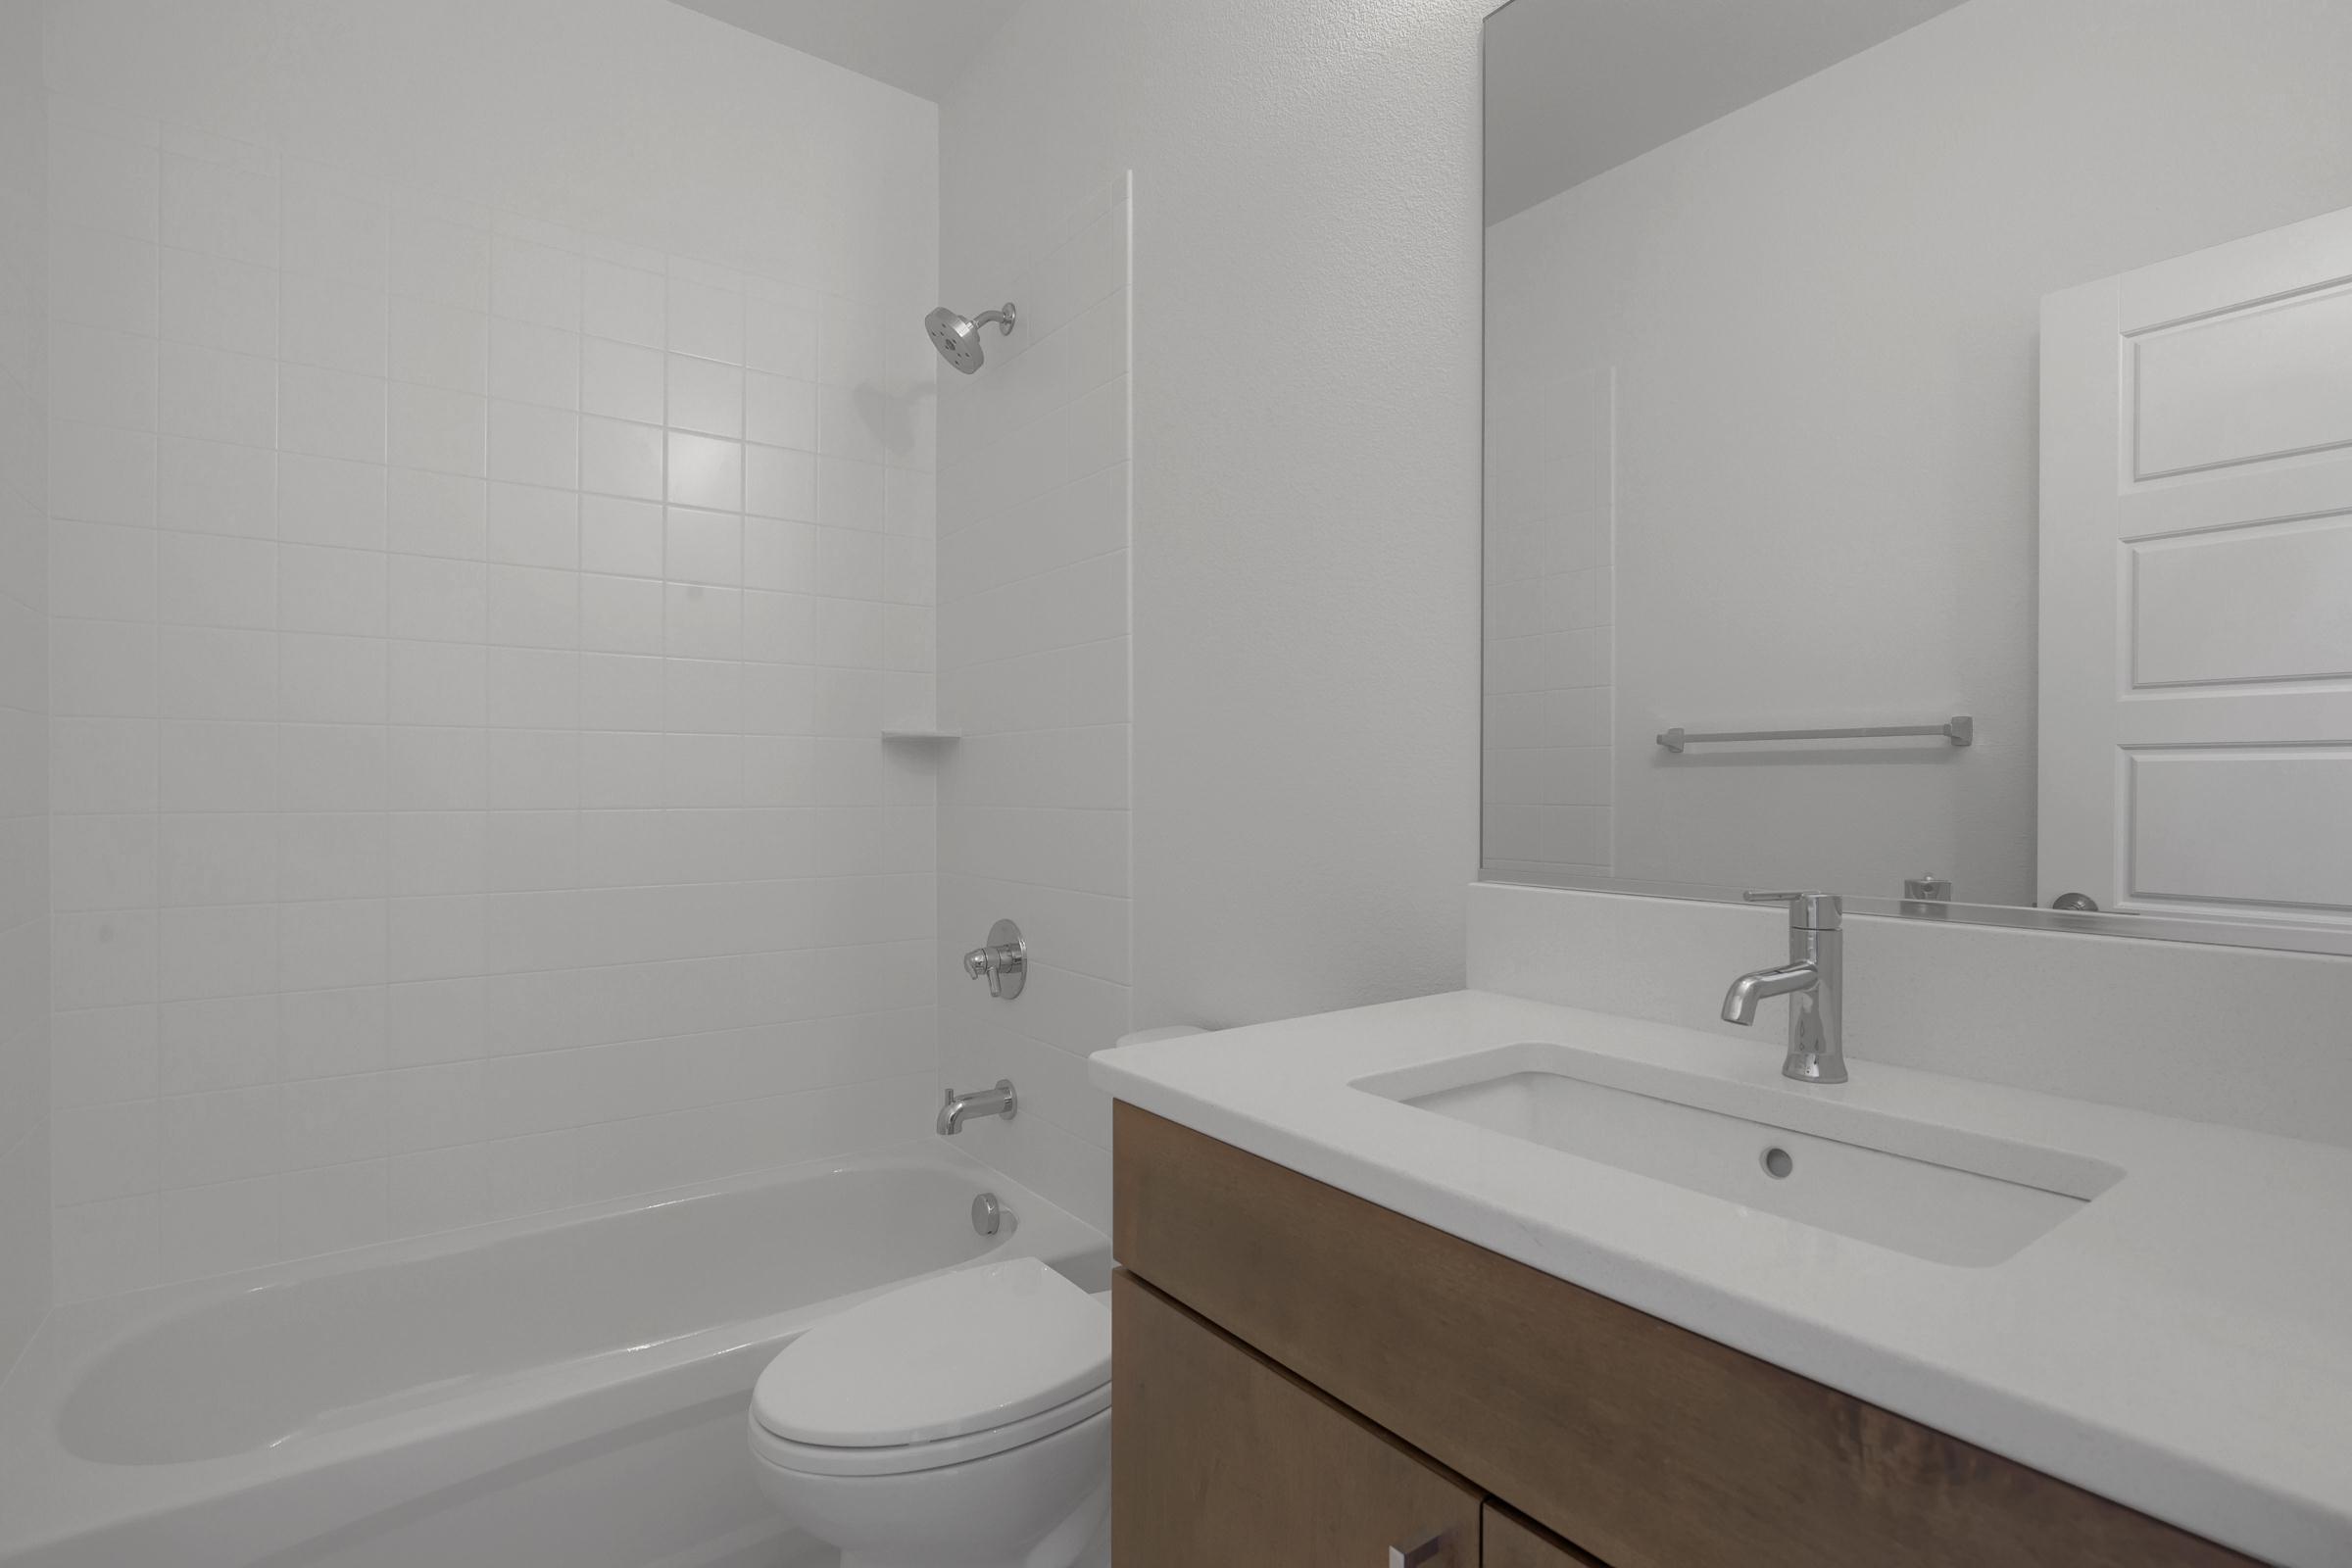 Bathroom featured in the Ellington By Keller Homes, A Toll Bros. Co. in Colorado Springs, CO